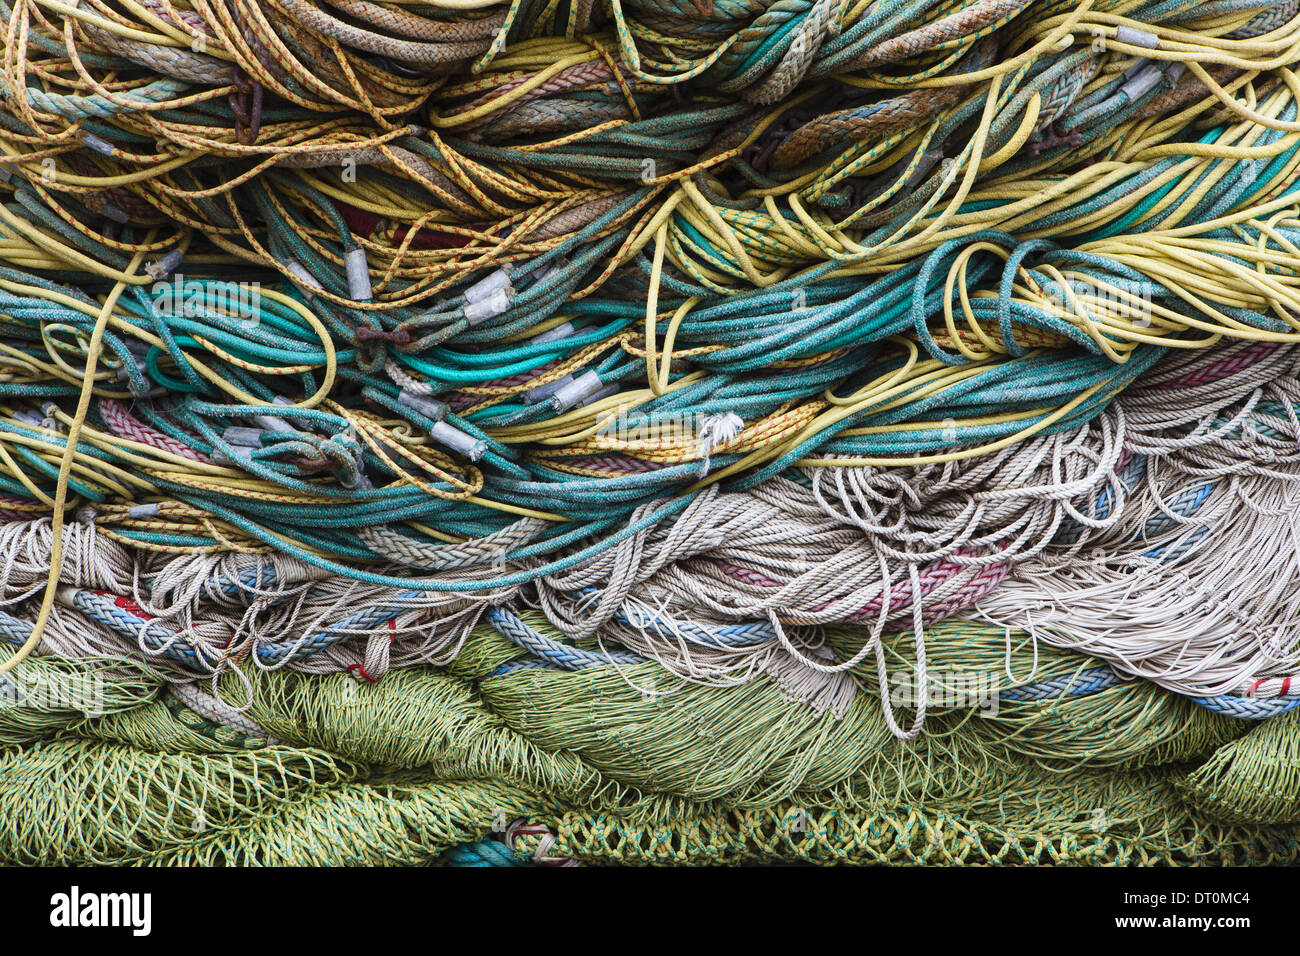 Seattle Washington USA Commercial fishing nets at Fisherman's Terminal - Stock Image